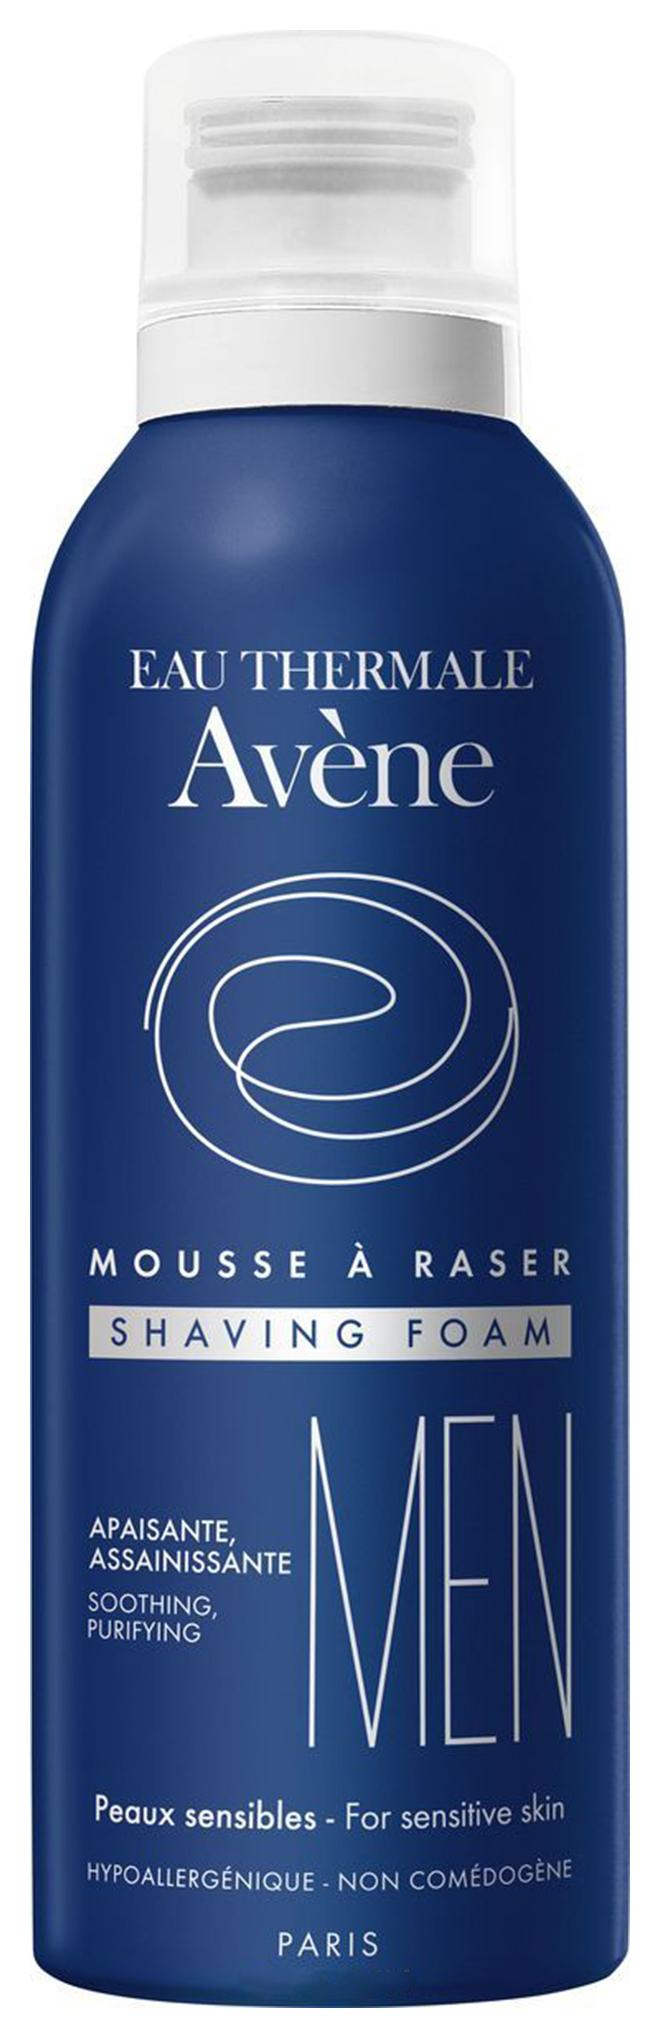 Пена для бритья Avene For men для всех типов кожи 200 мл